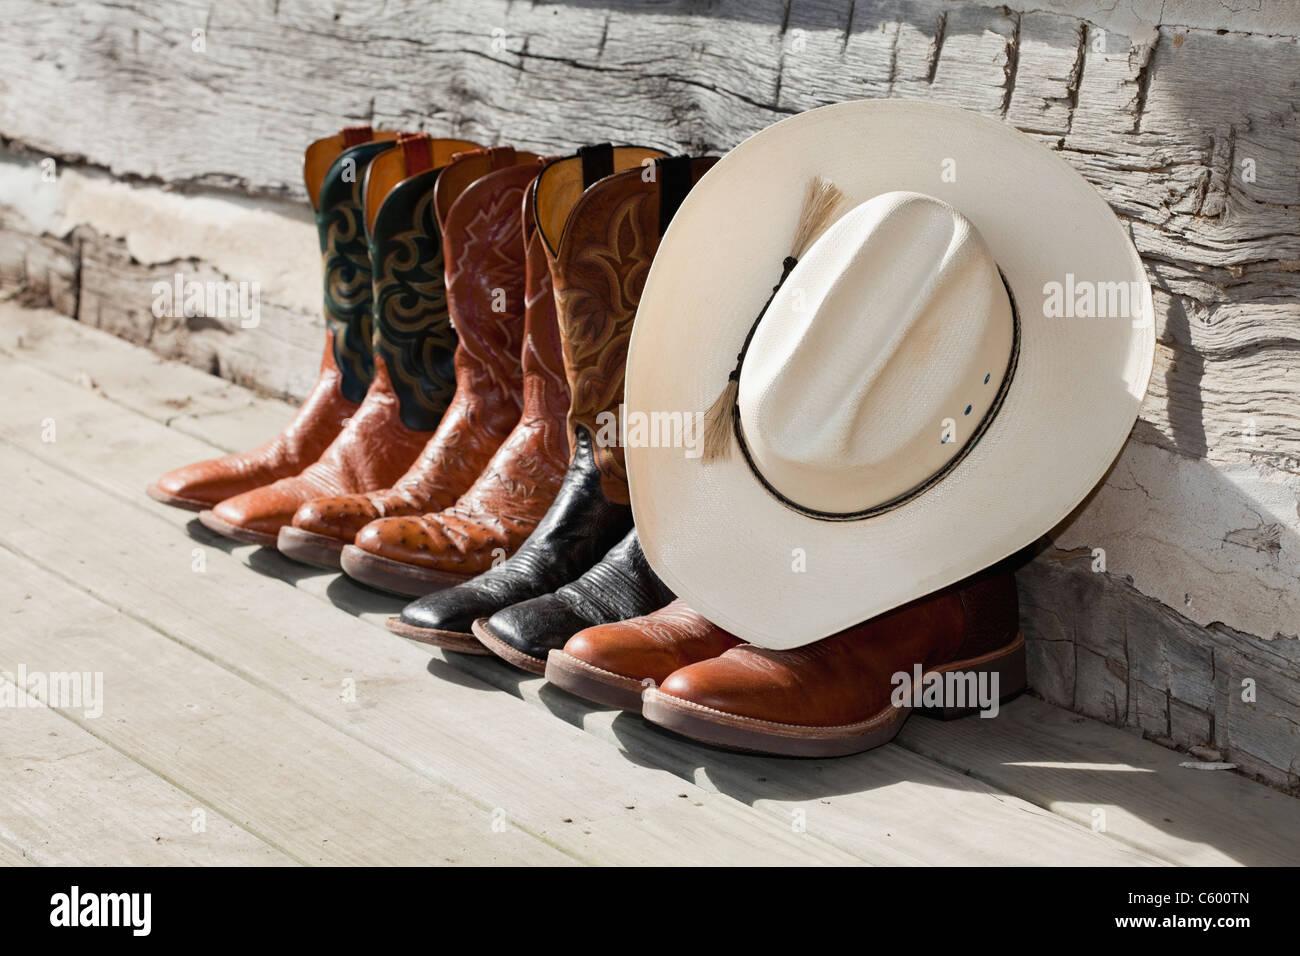 USA, Illinois, Metamora, Row of cowboy boots and cowboy hat - Stock Image